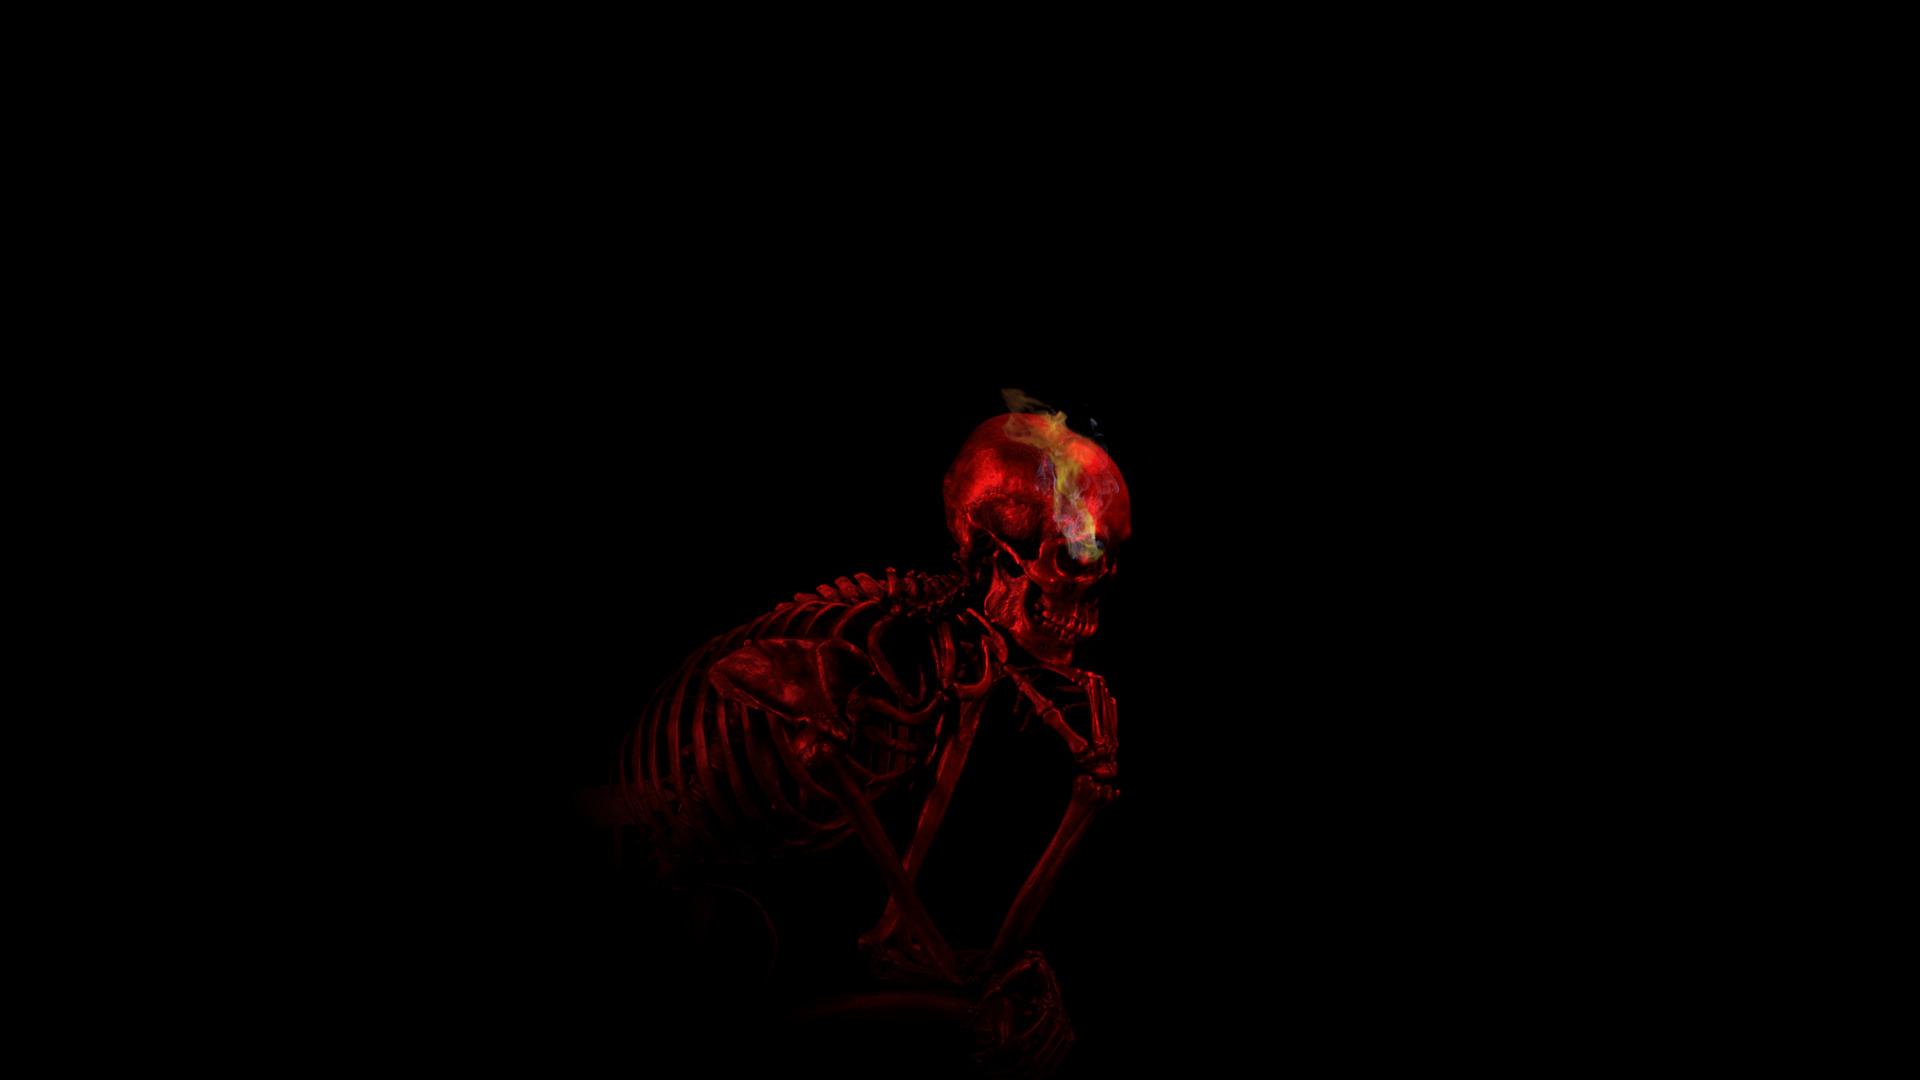 Cool Animated Pubg Wallpapers Thinking Ribs Teeth Auguste Rodin Digital Art Skull